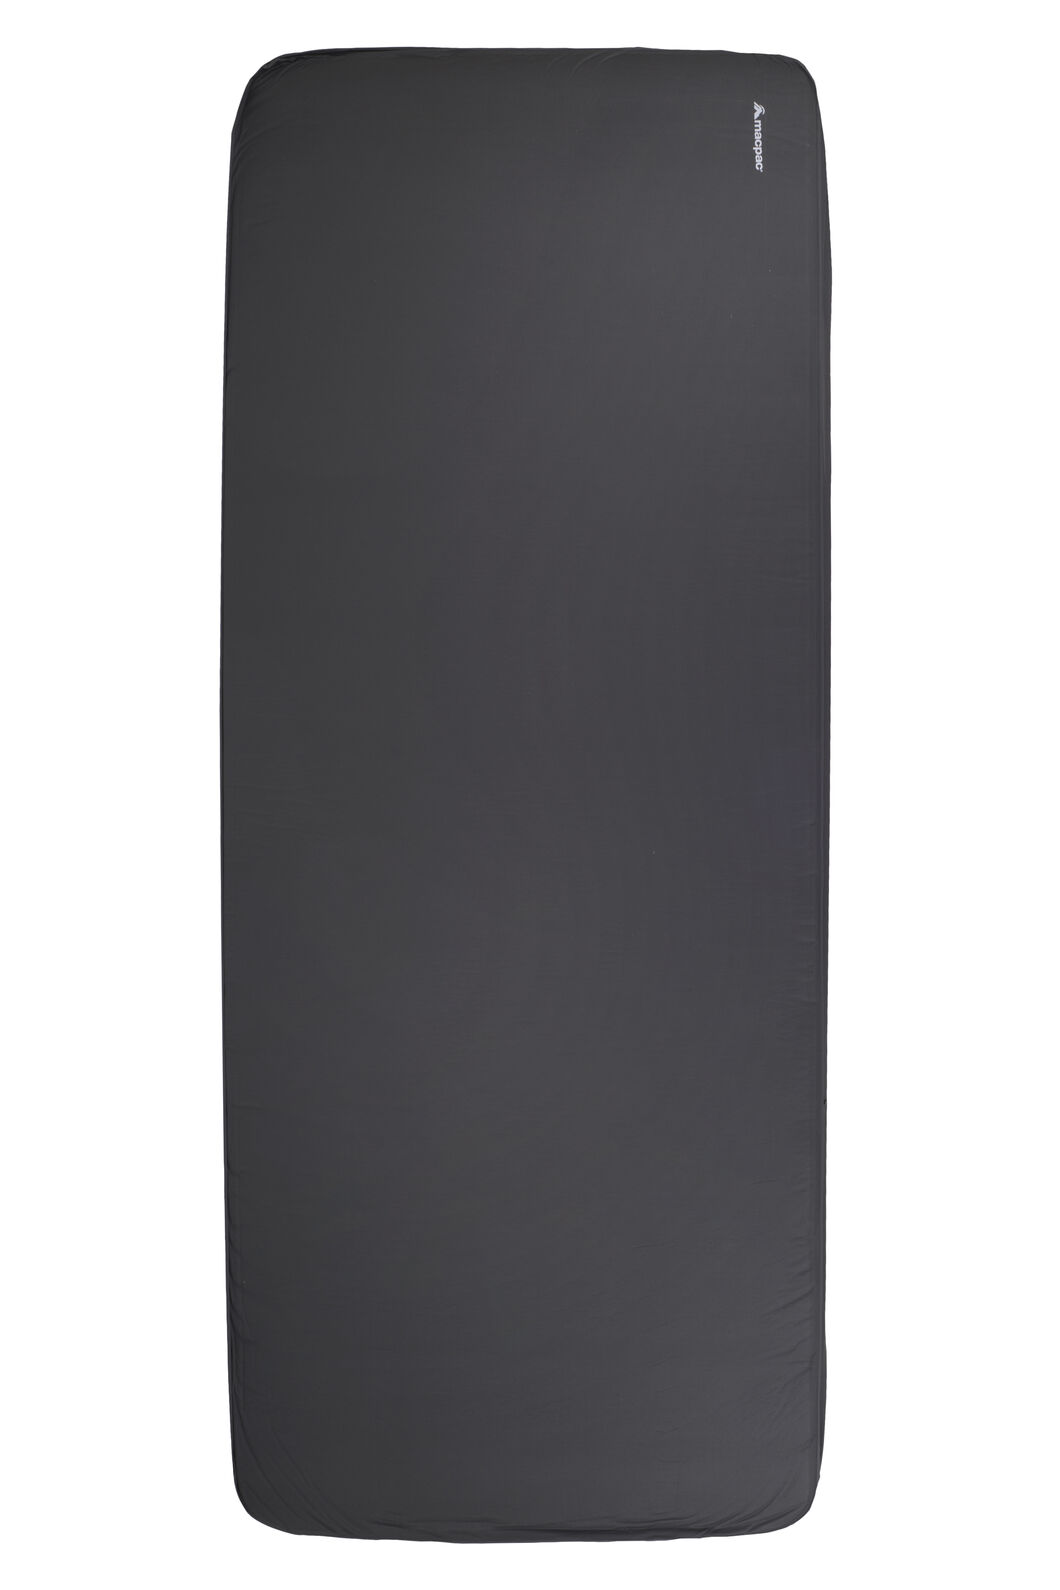 Macpac Deluxe Single Mat, Charcoal, hi-res